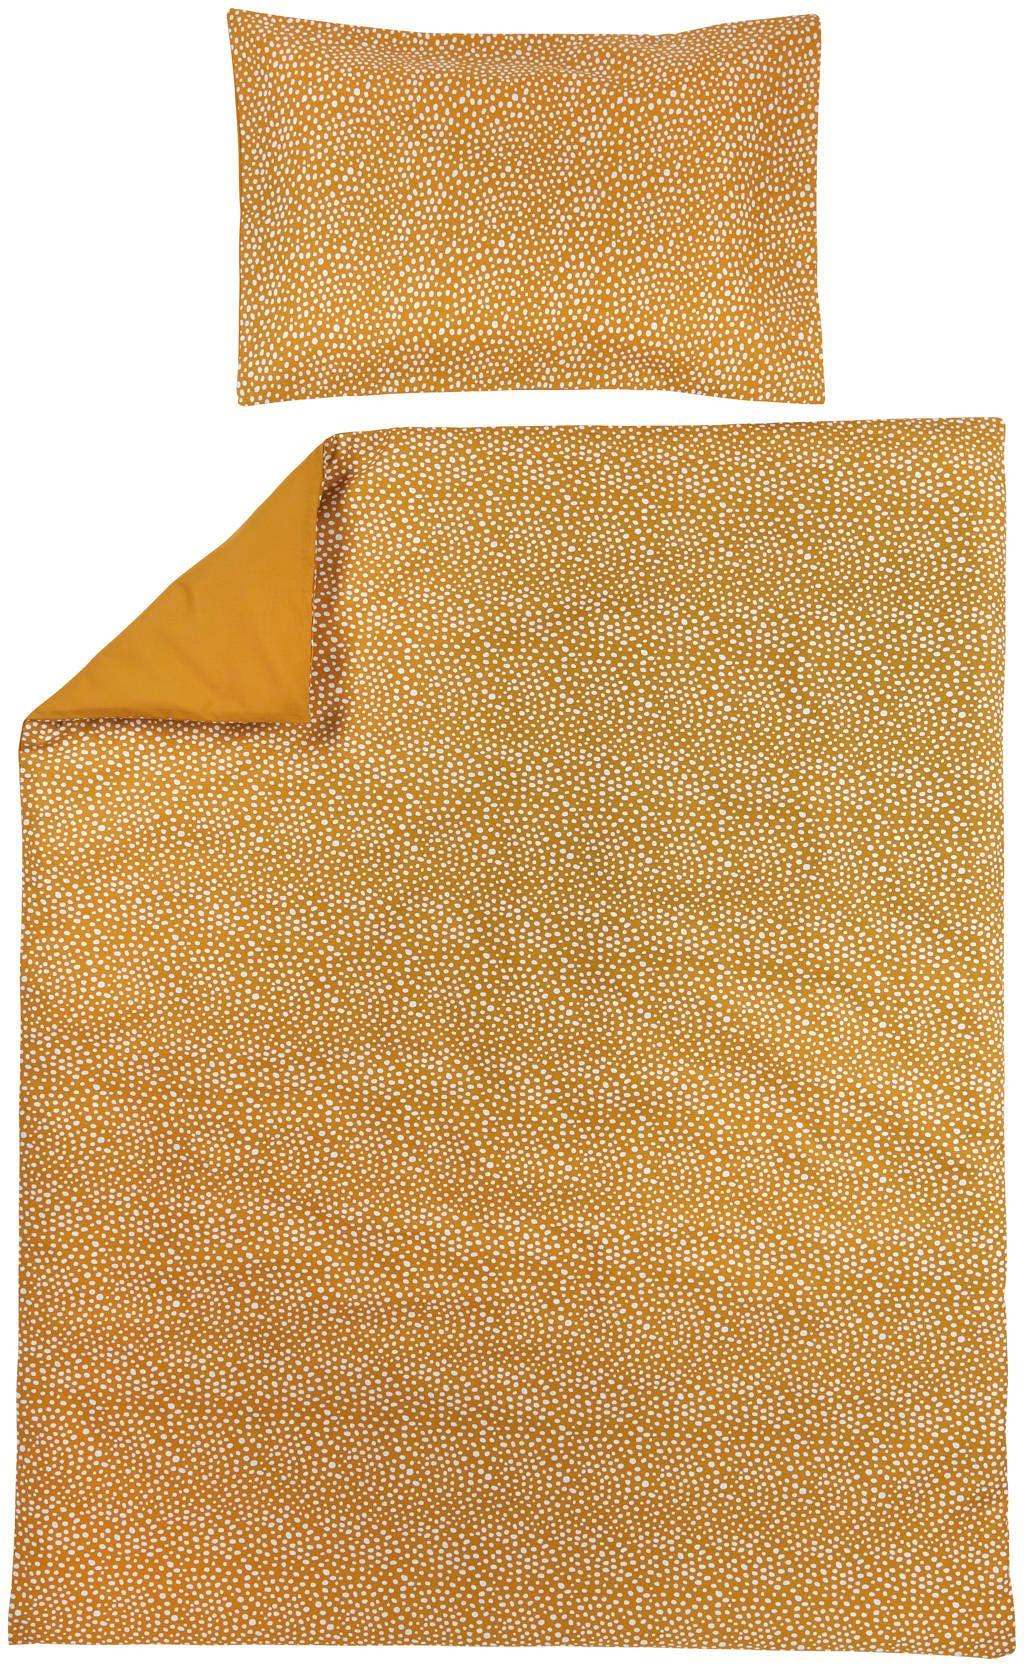 Meyco ledikant dekbedovertrek + kussensloop 120x150 cm Cheetah/Uni honey gold, Goud